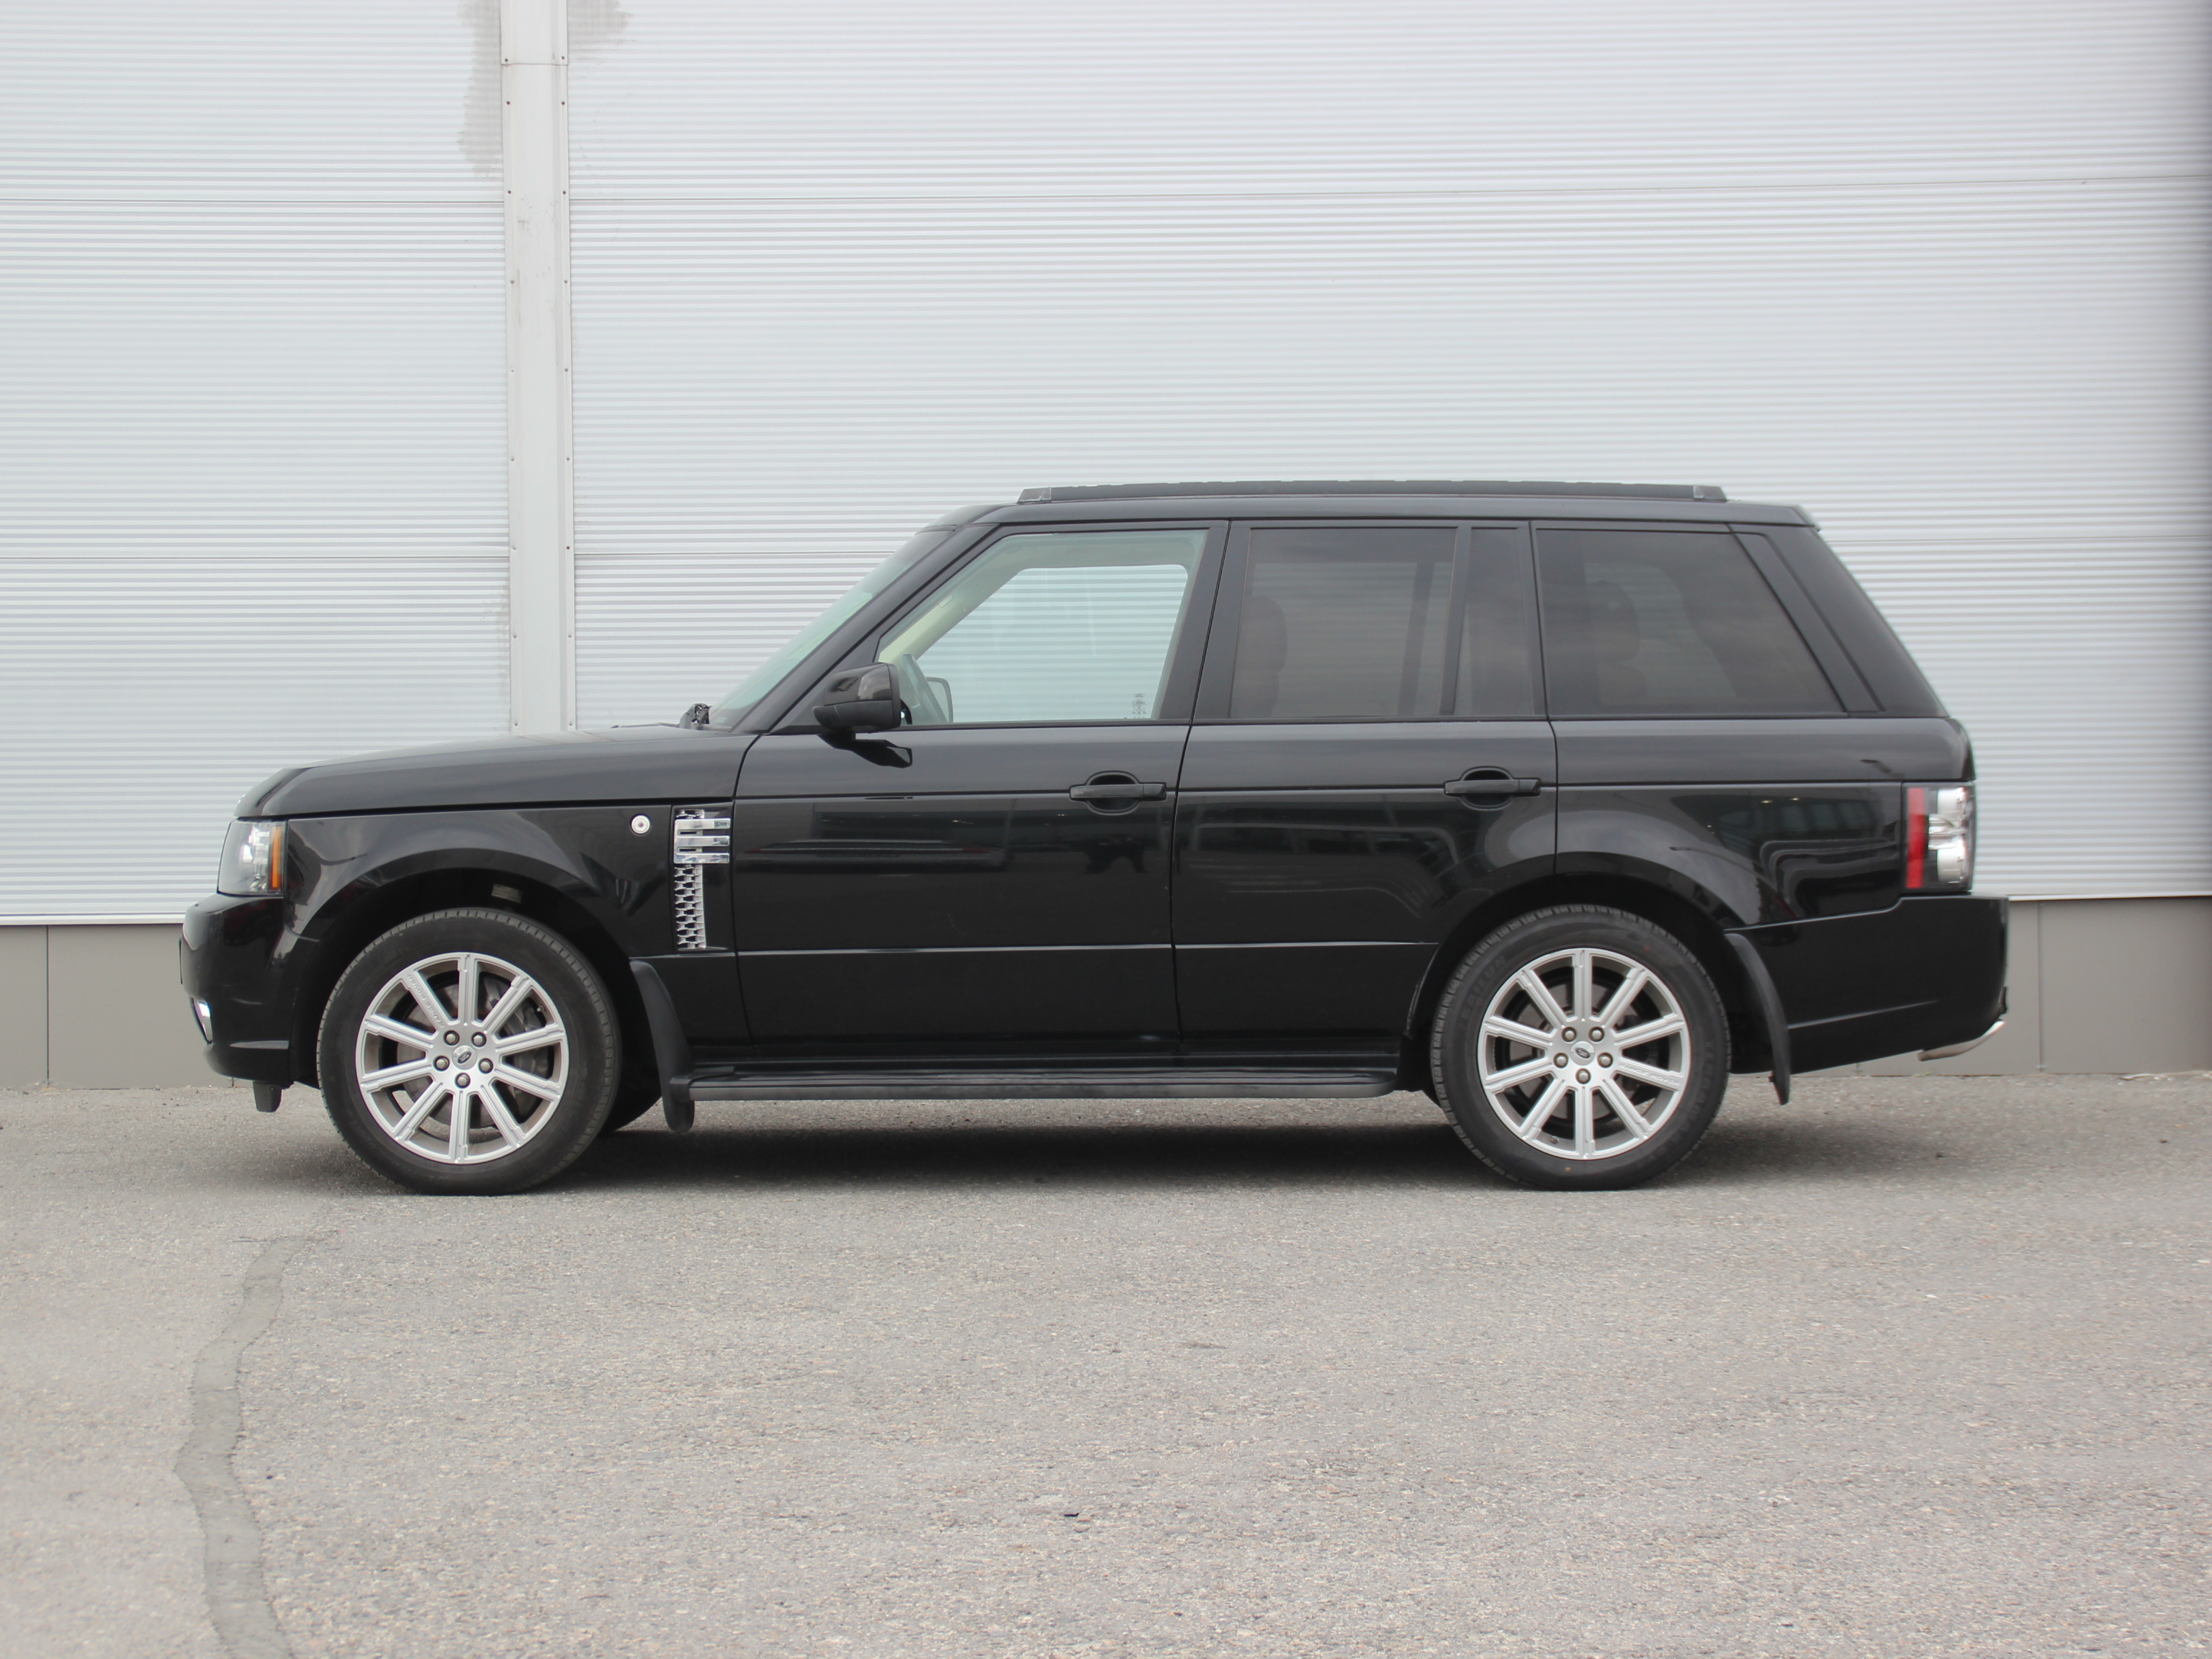 Land Rover Range Rover Внедорожник (2012г.)